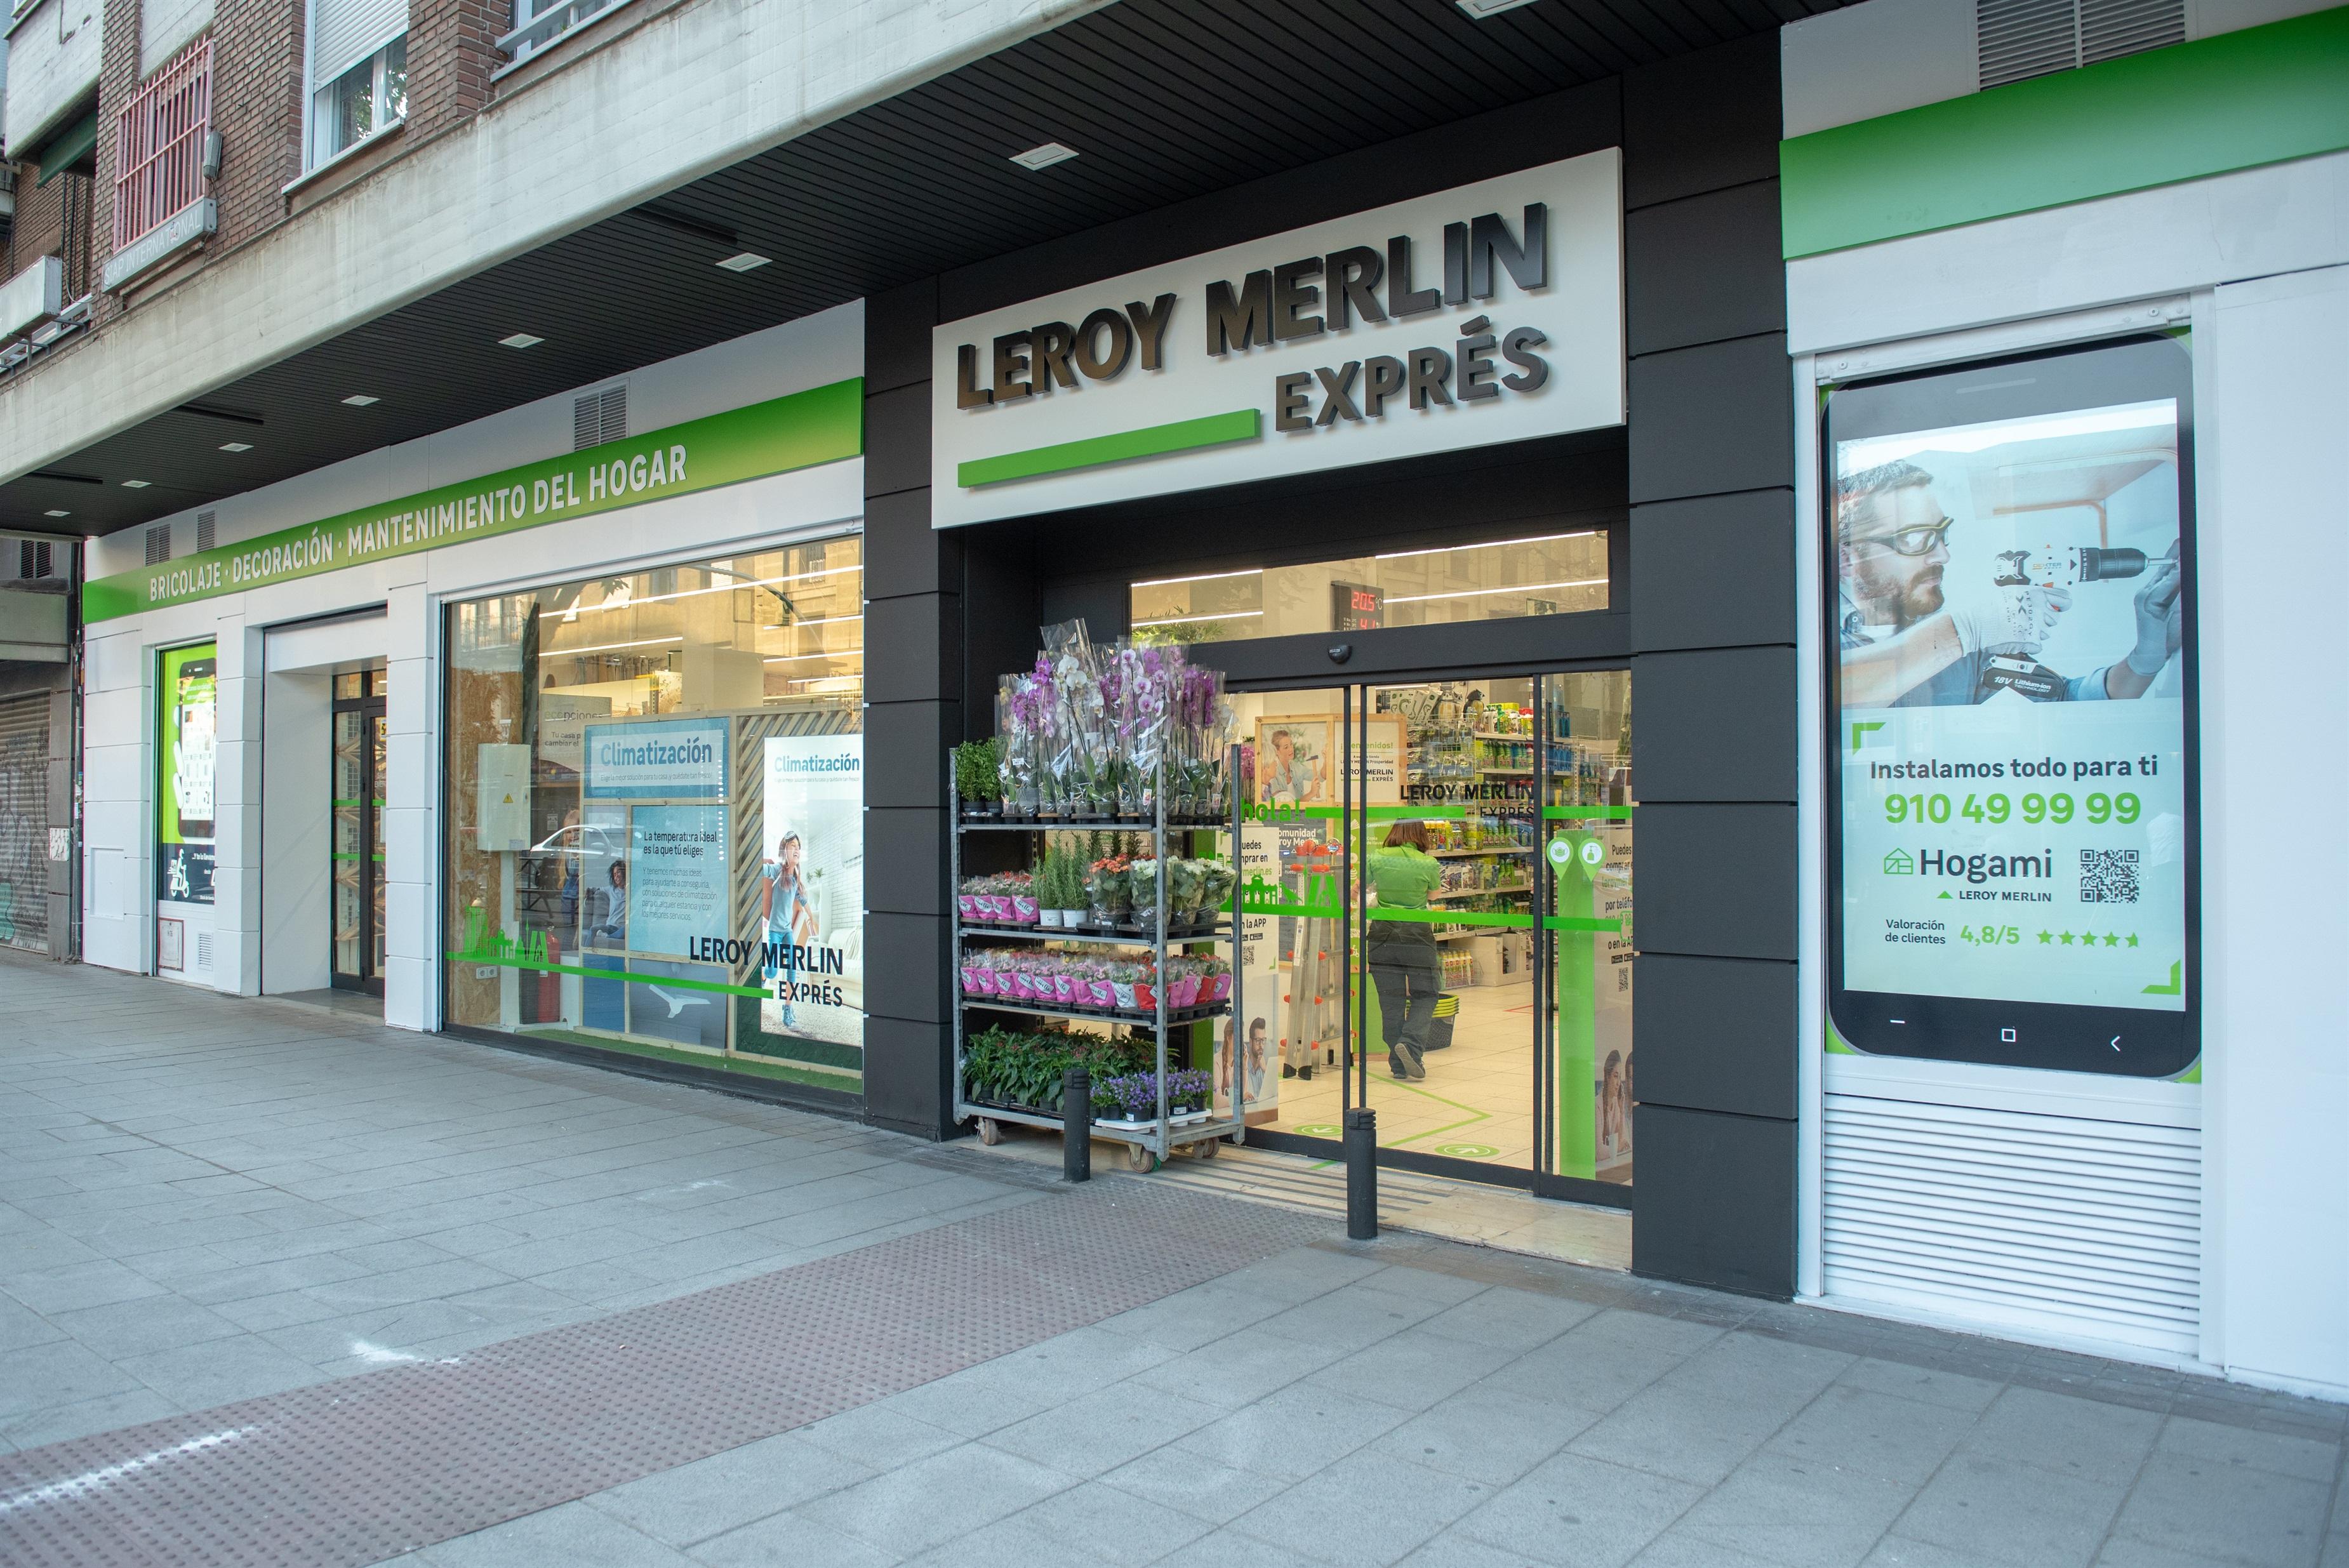 Leroy Merlin Express